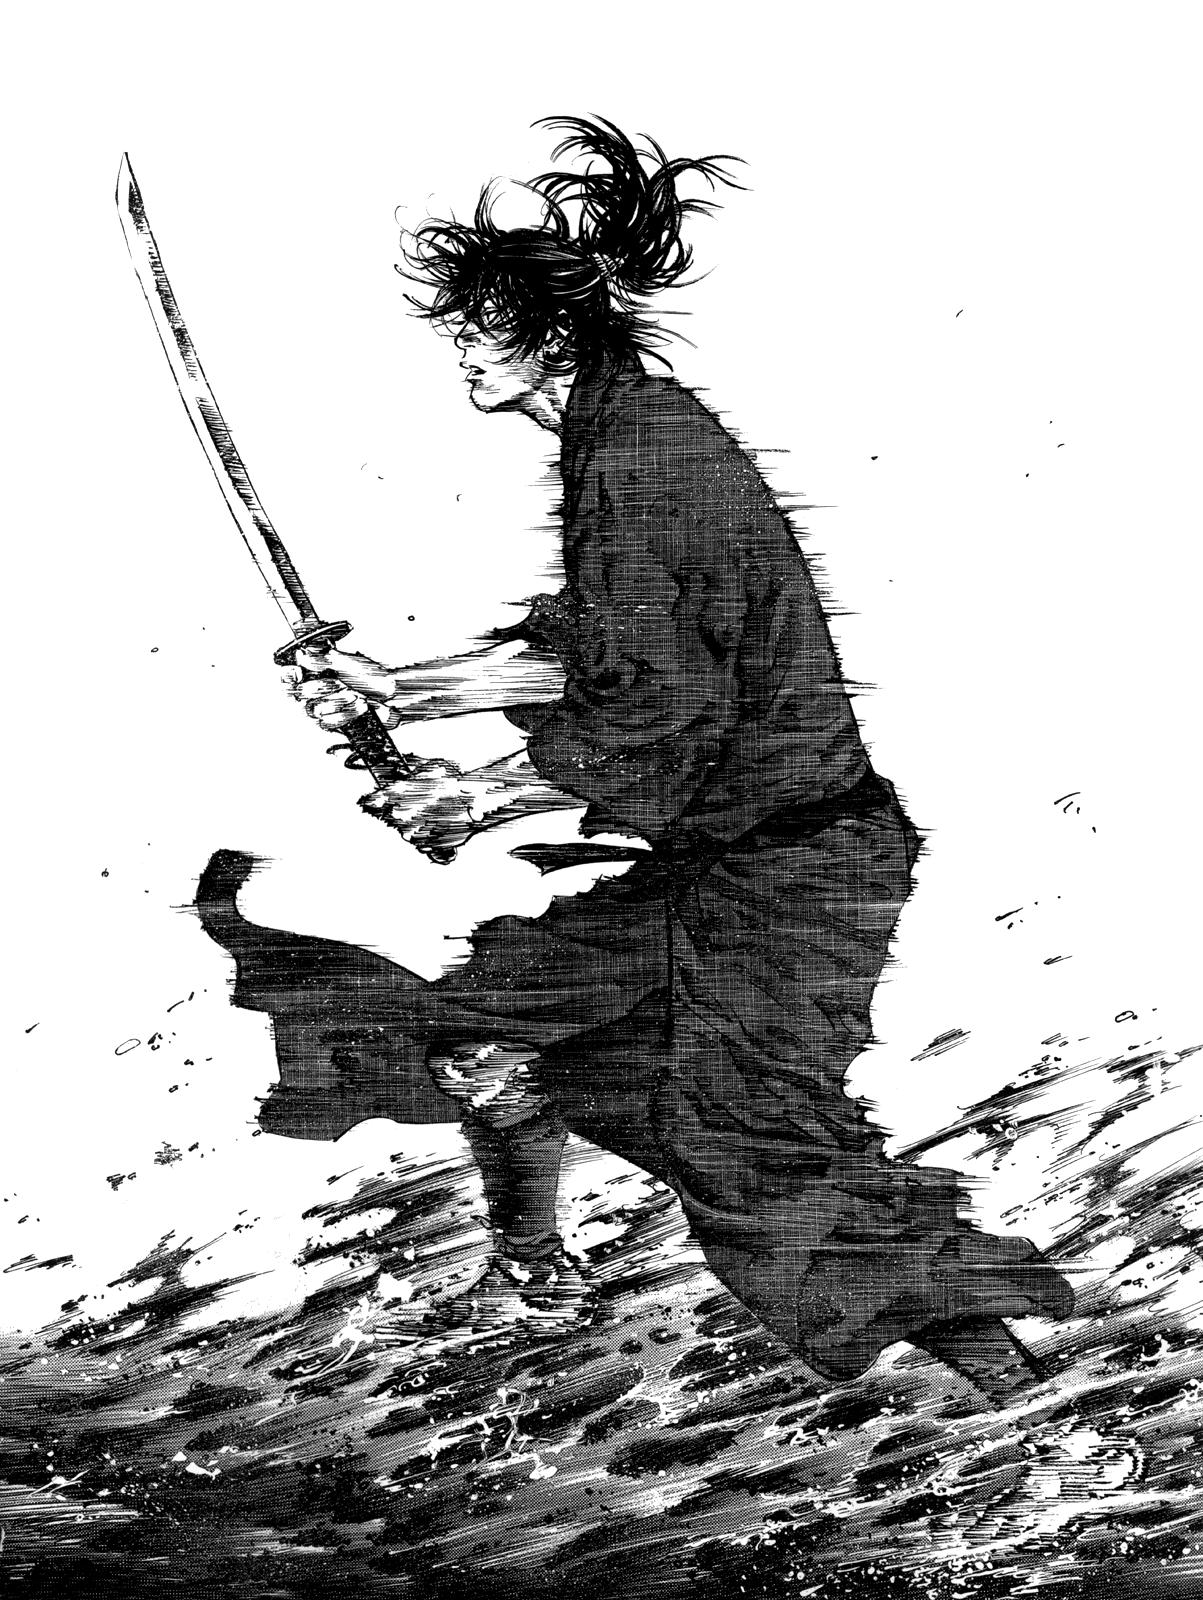 ardte: Samurai Icon: Musashi (manga version)